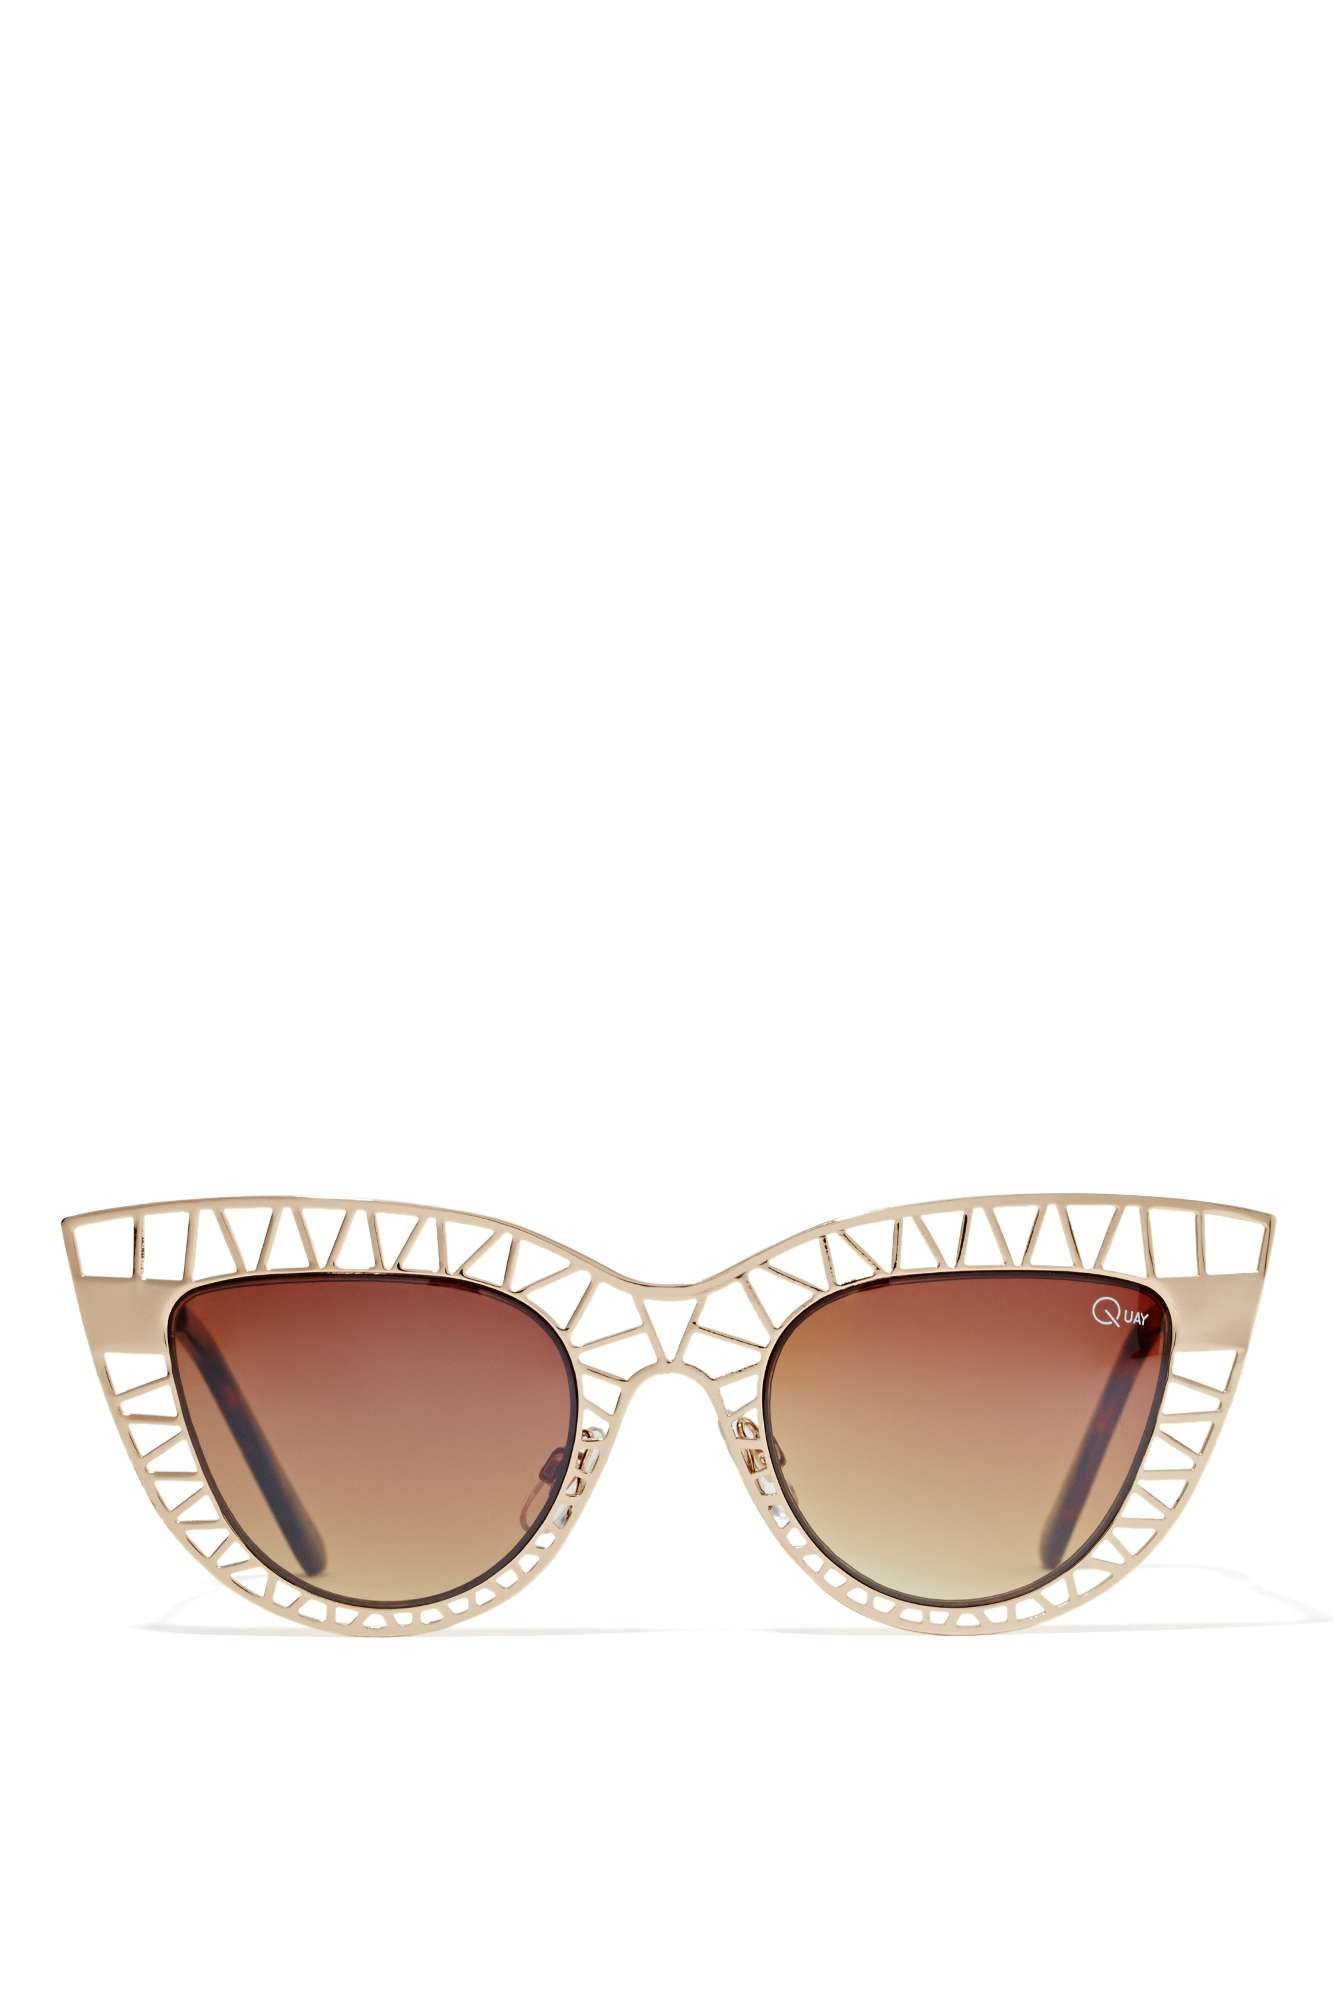 Quay Steel Kitti Shades   Shop Eyewear at Nasty Gal. Óculos De SolBijuBeleza Óculos ... b411470d55